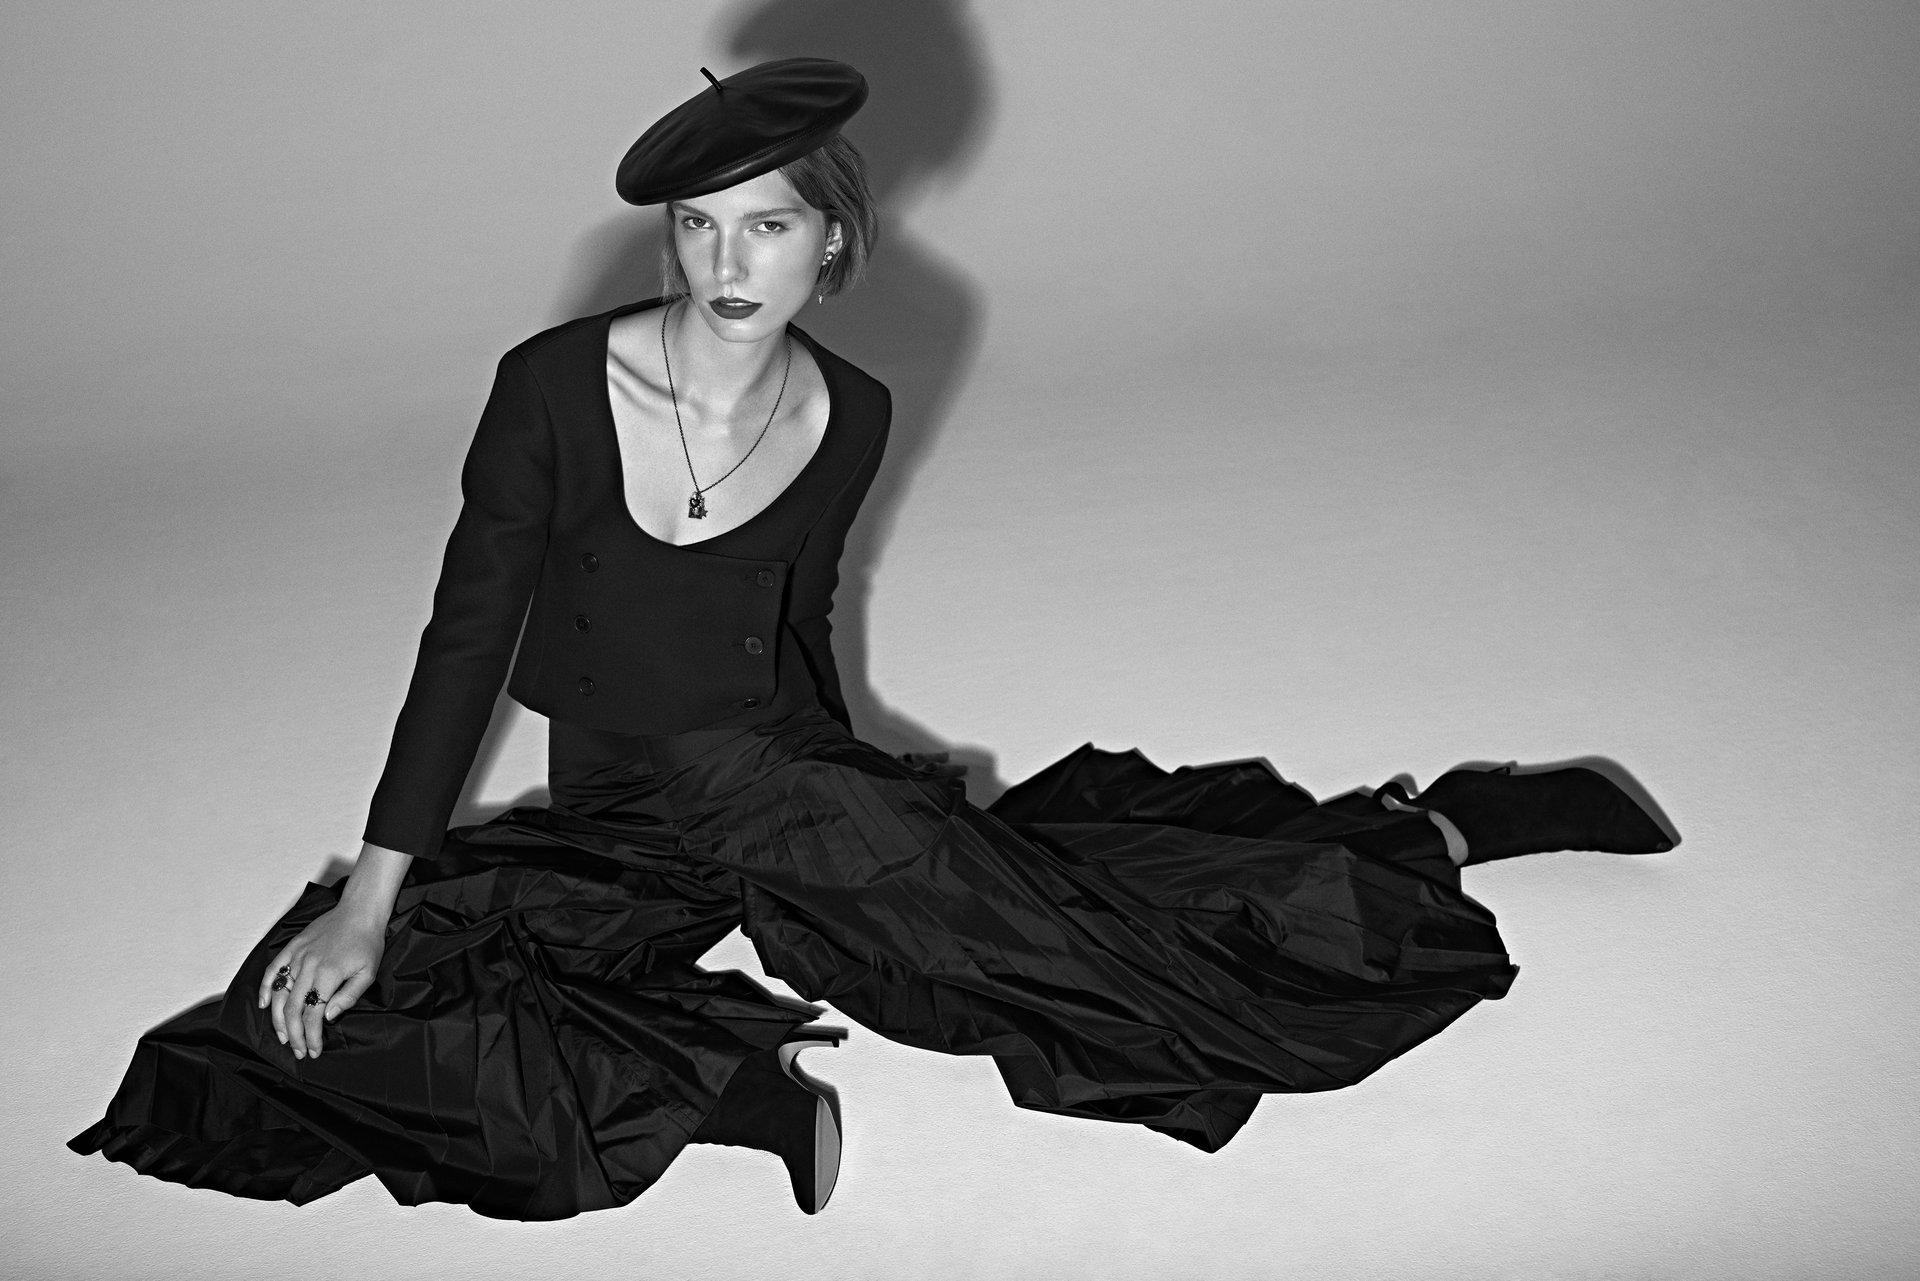 Dior - Emirates Woman